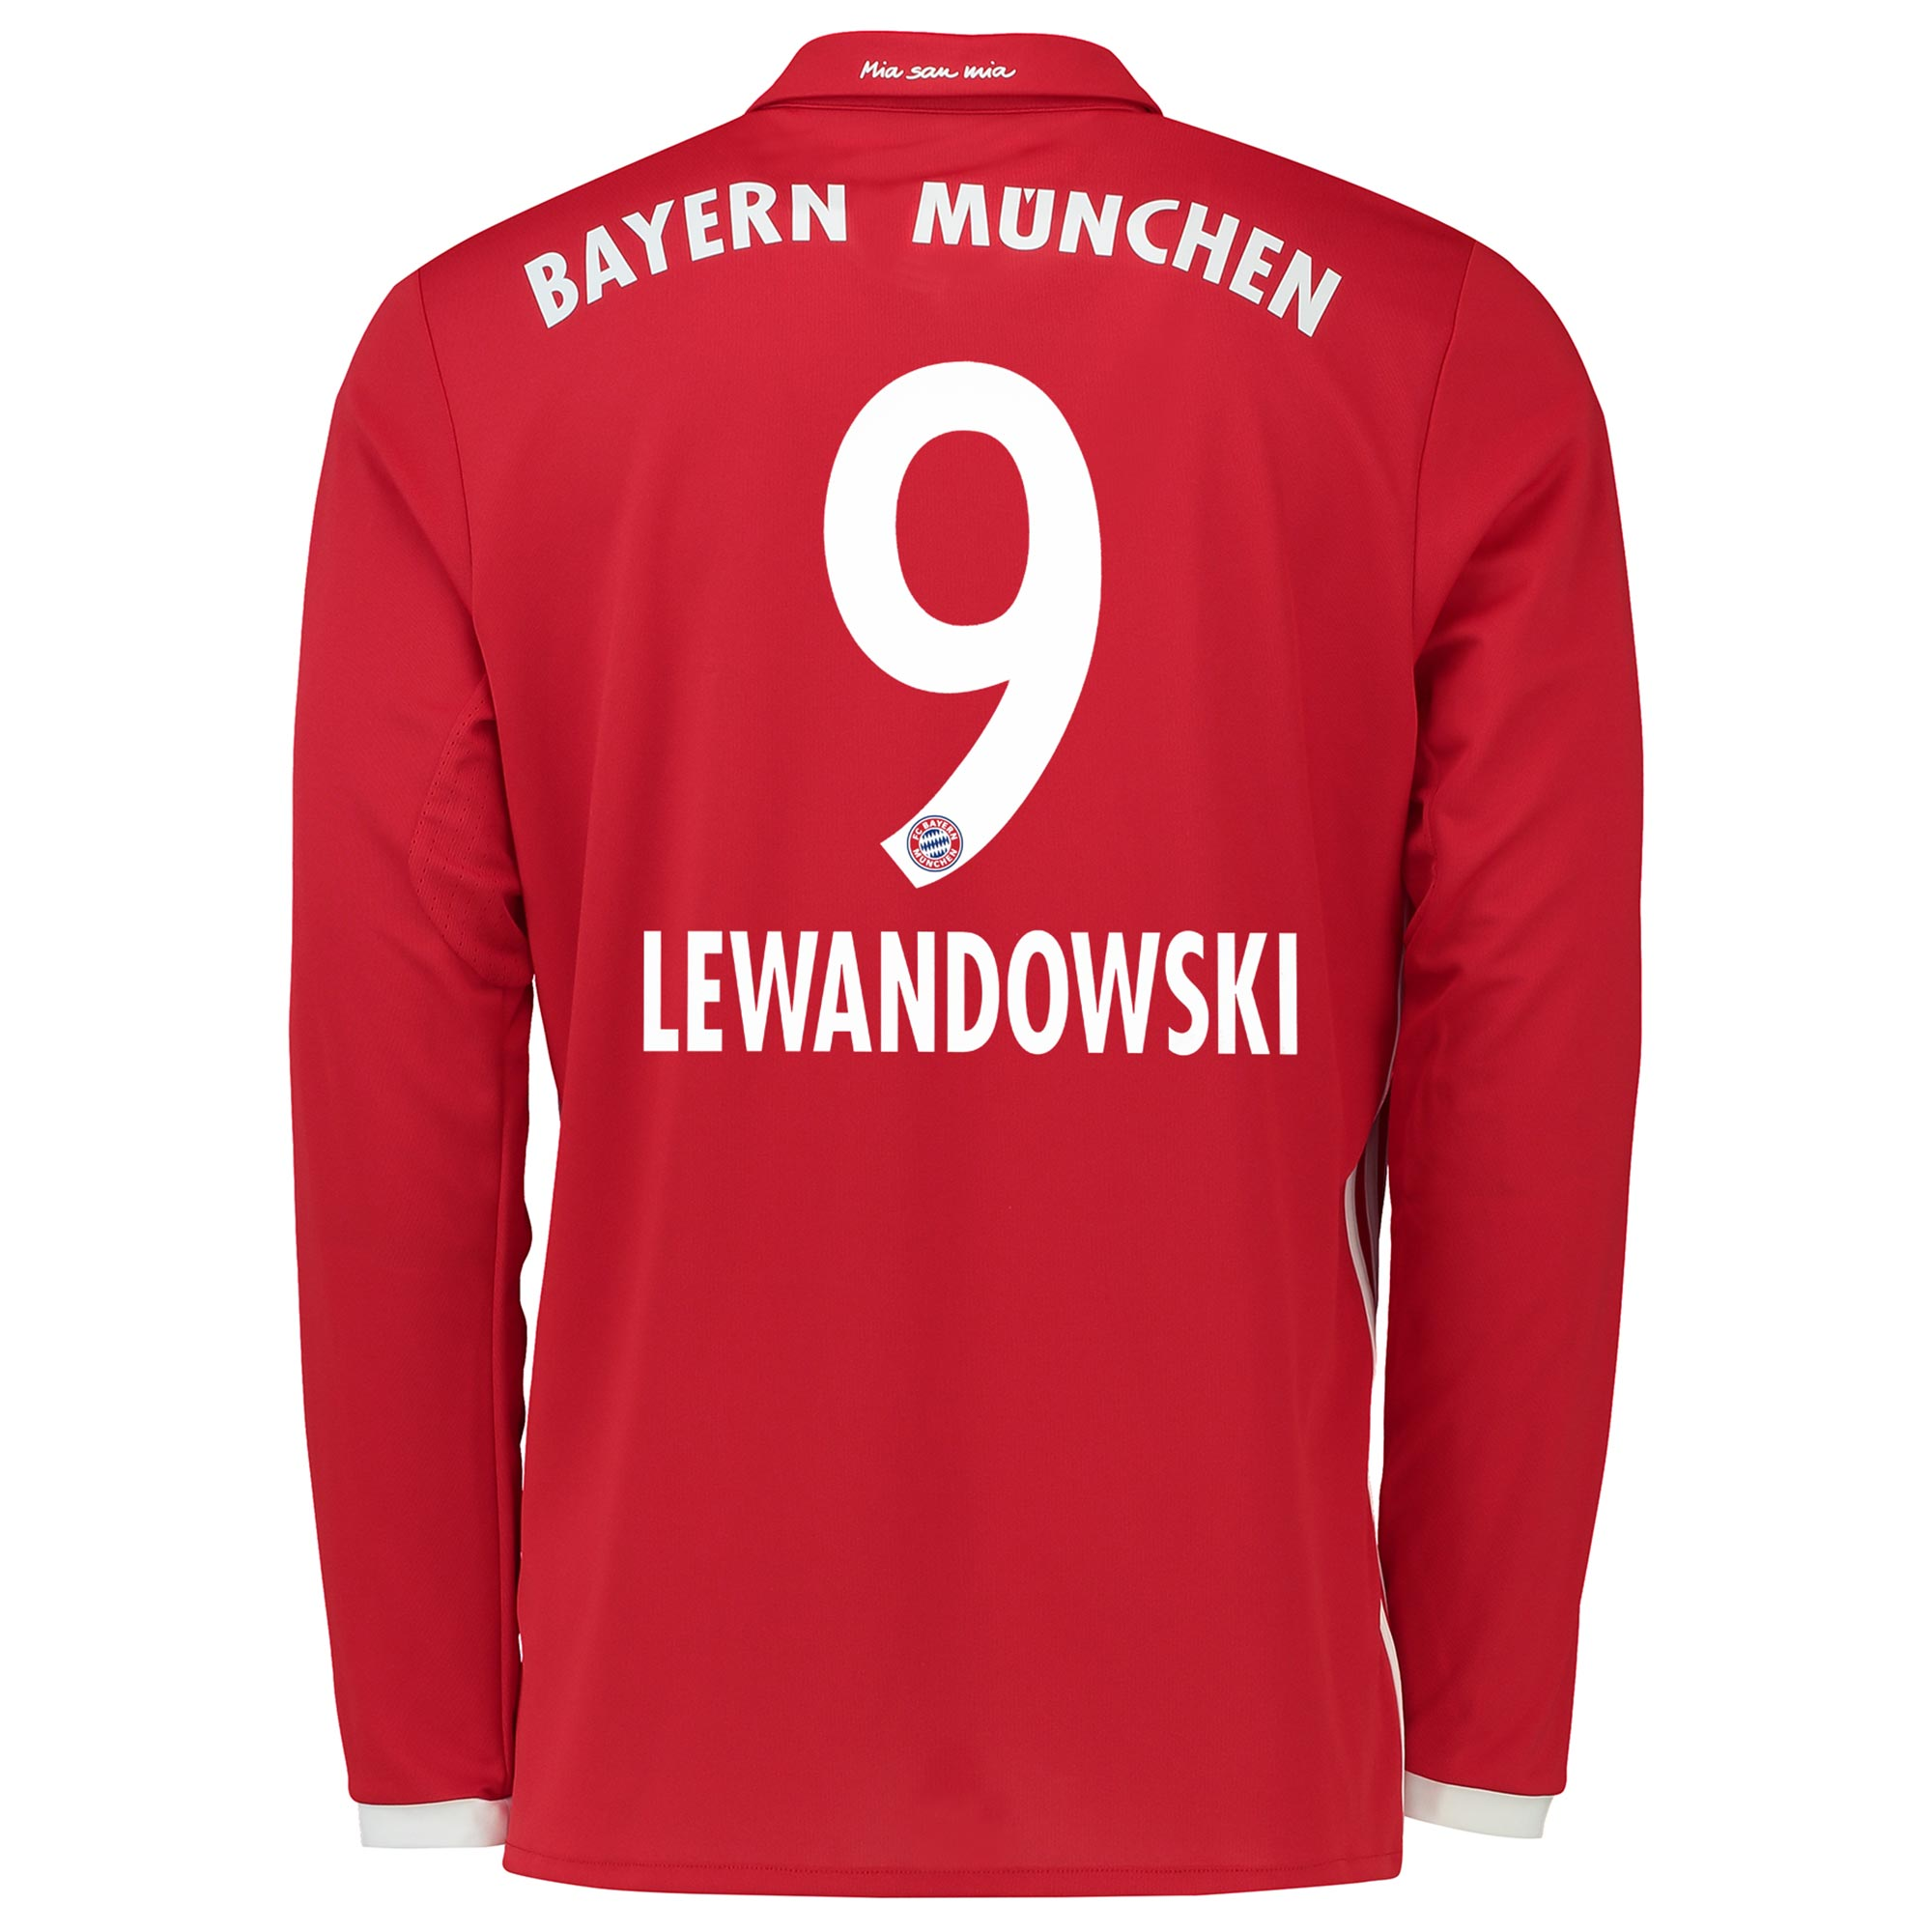 Image of Bayern Munich Home Shirt 2016-17 - Long Sleeve with Lewandowski 9 prin, Red